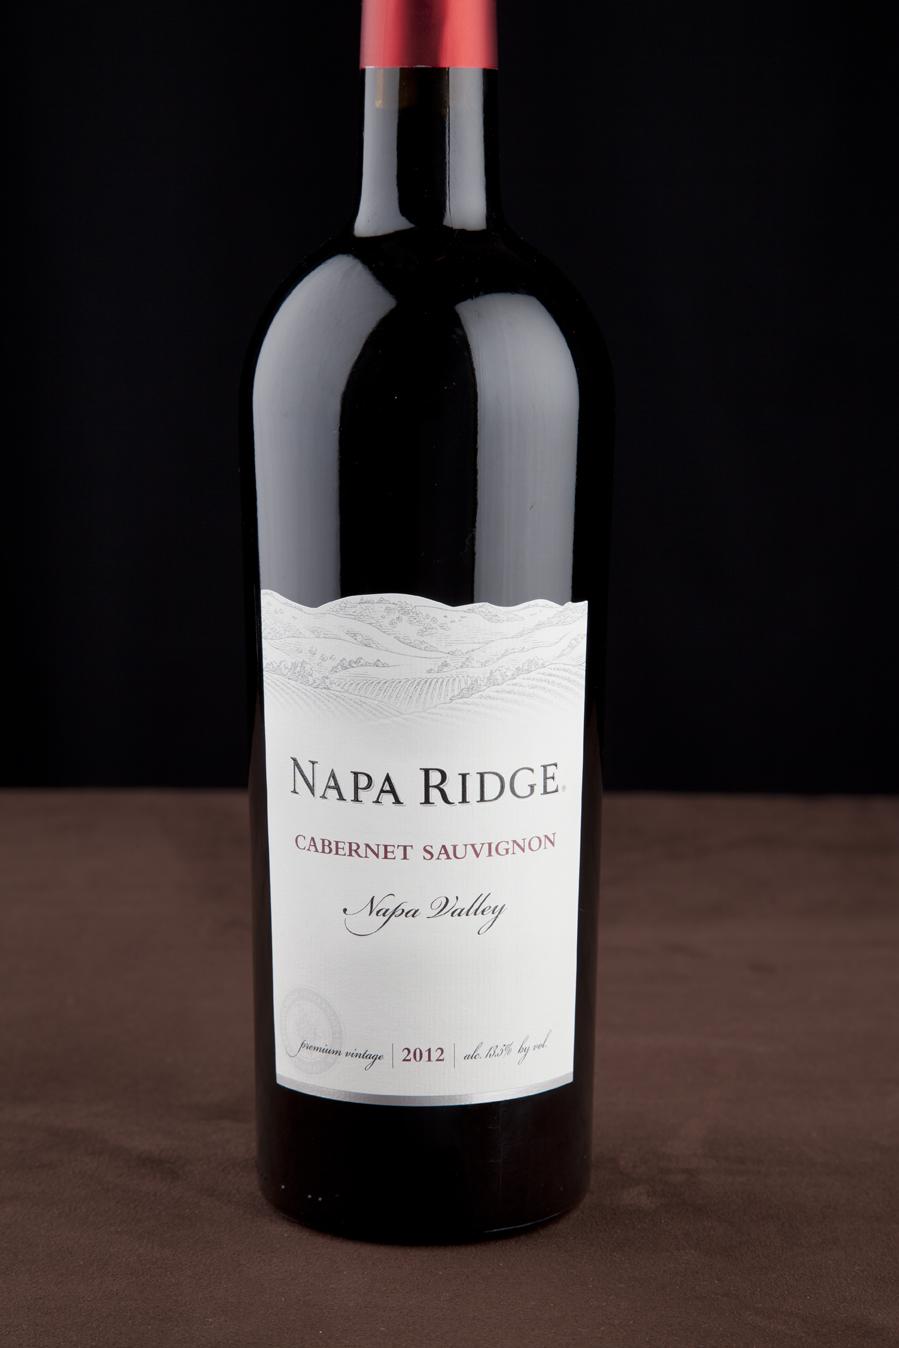 Napa Ridge